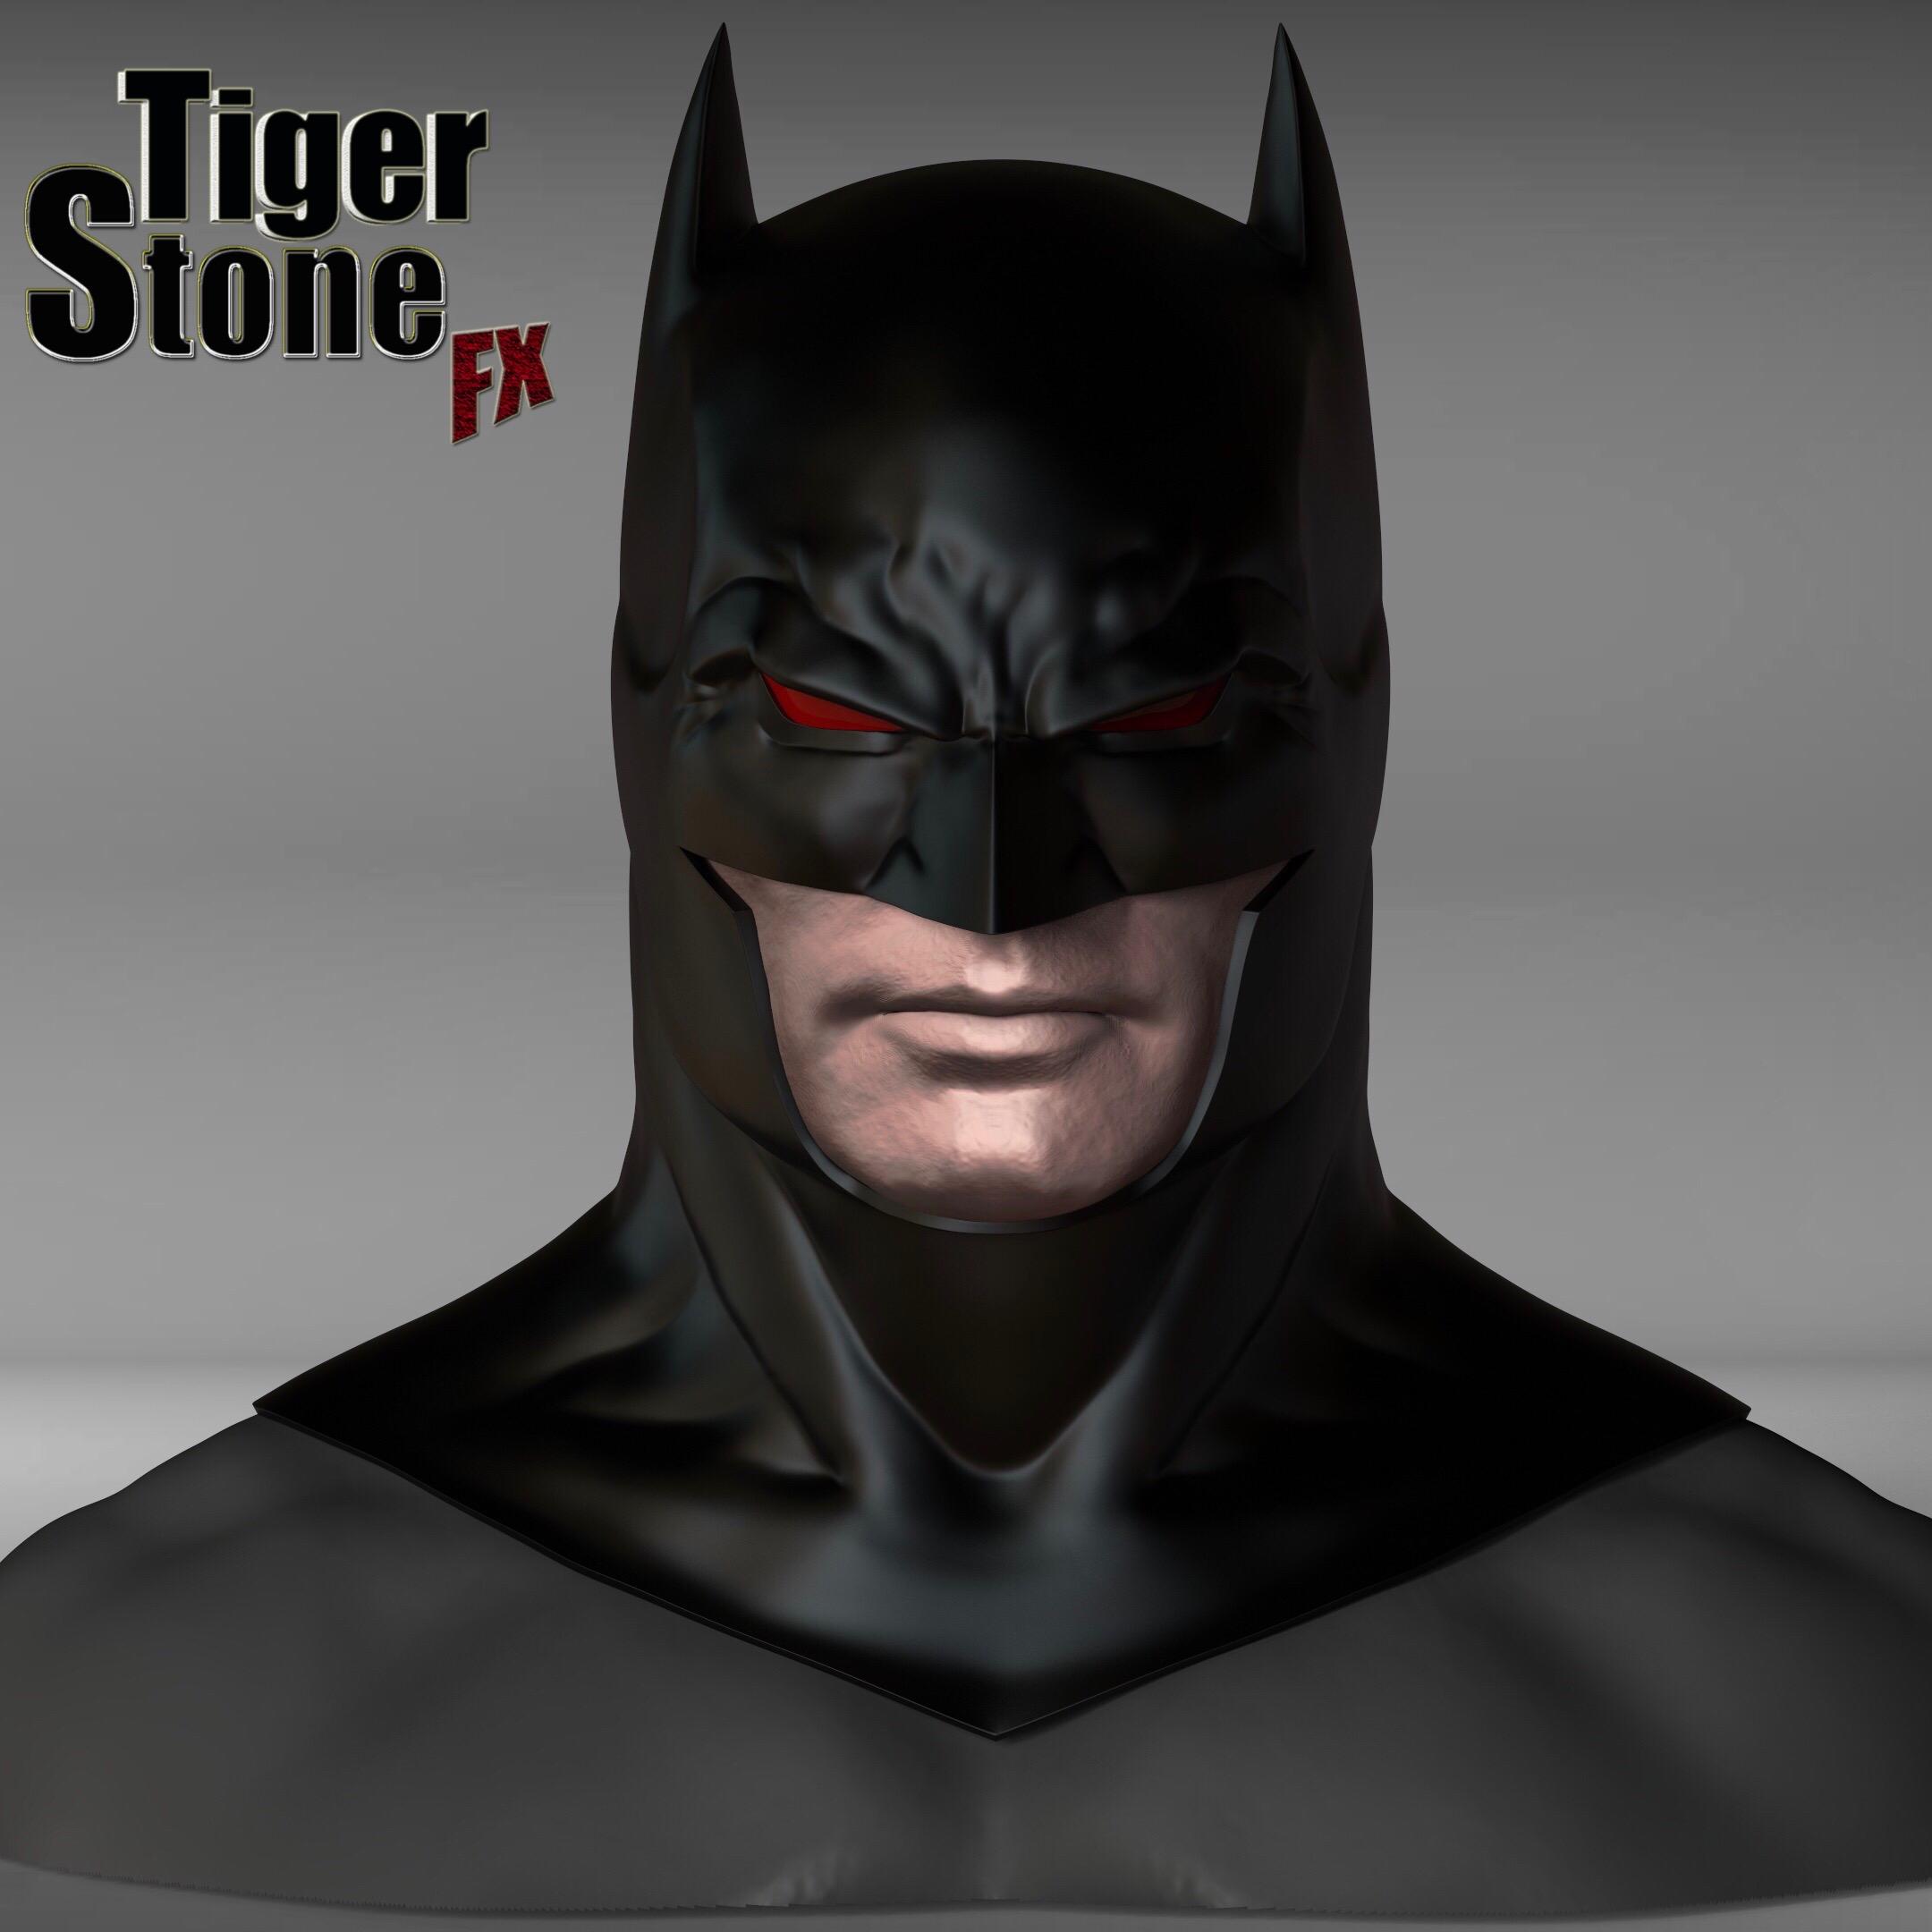 thomas wayne flashpoint batman rebirth cowl mask for